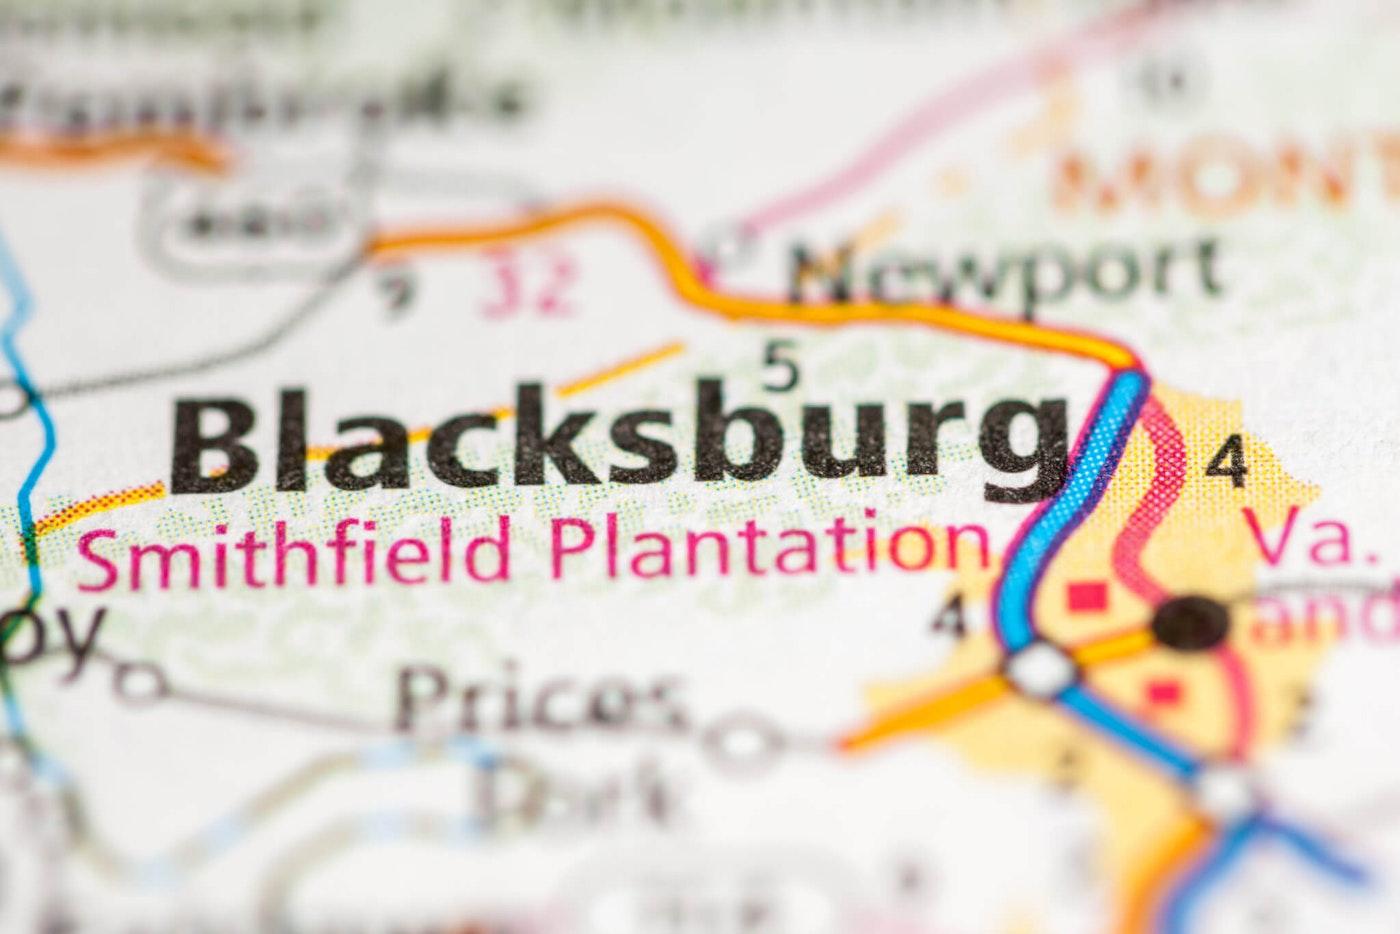 Where Did The Blacksburg Bucks Go?